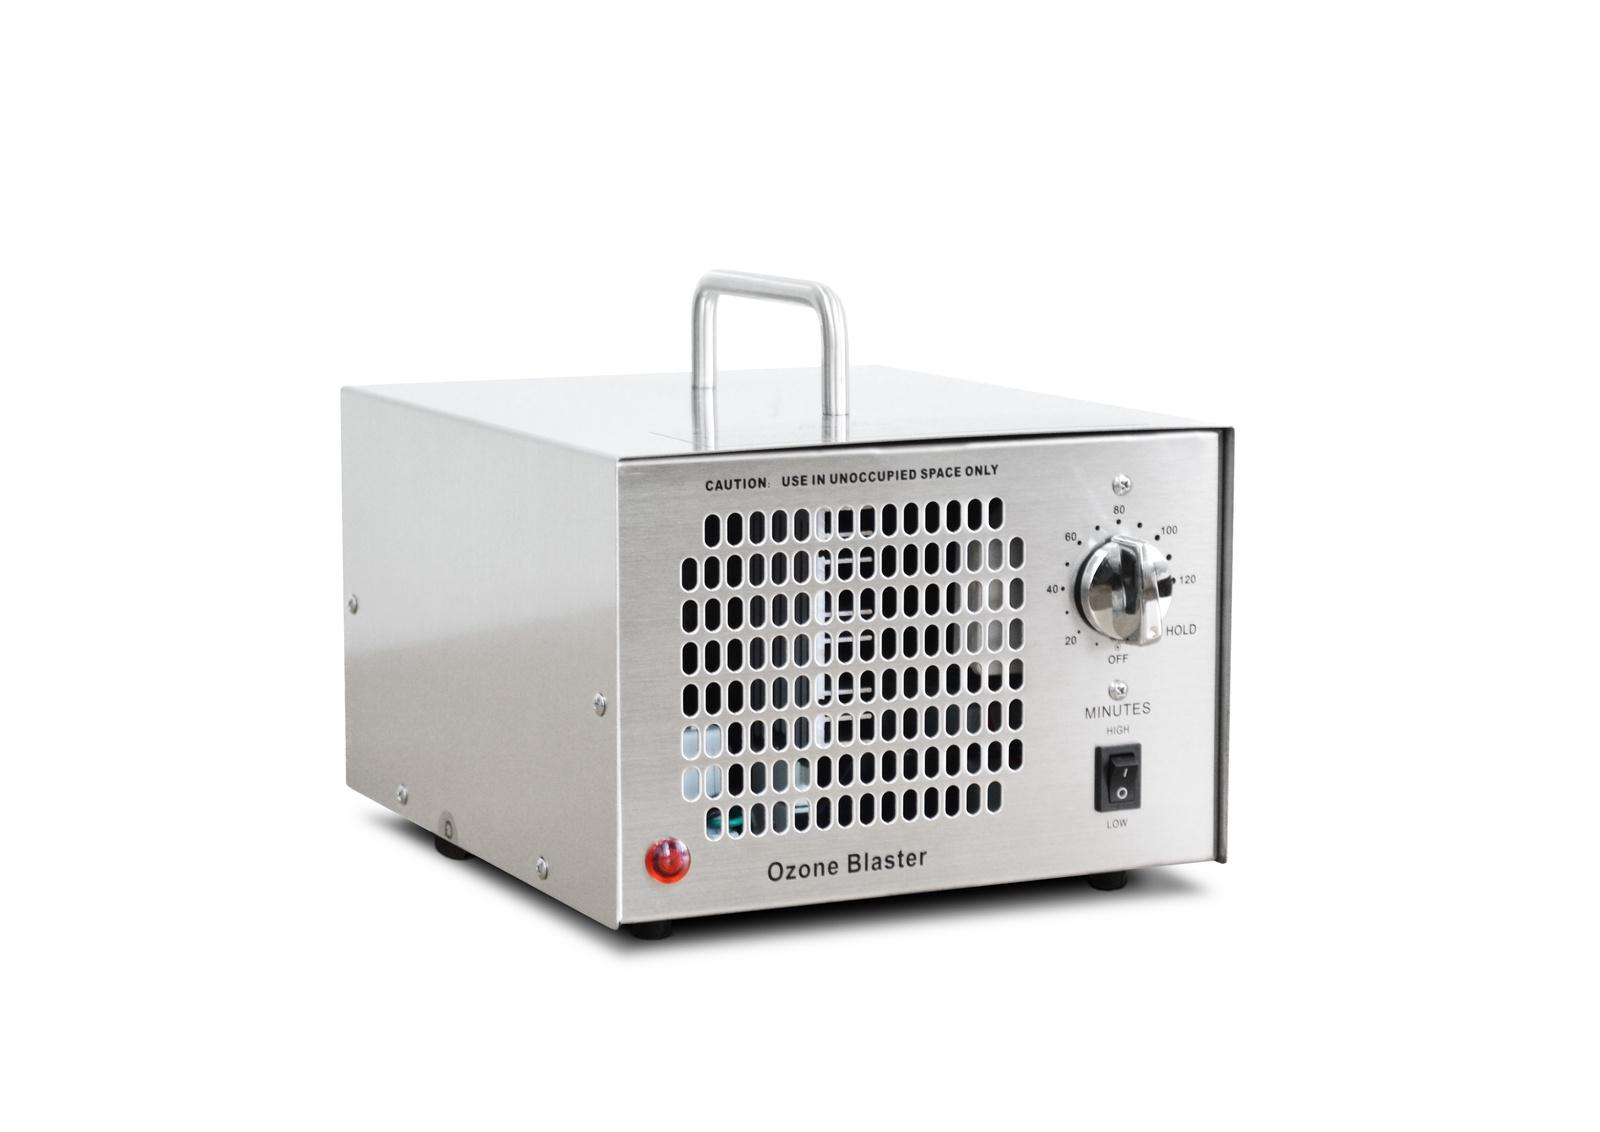 Озонатор для удаления неприятных запахов Ozone Blaster 7G